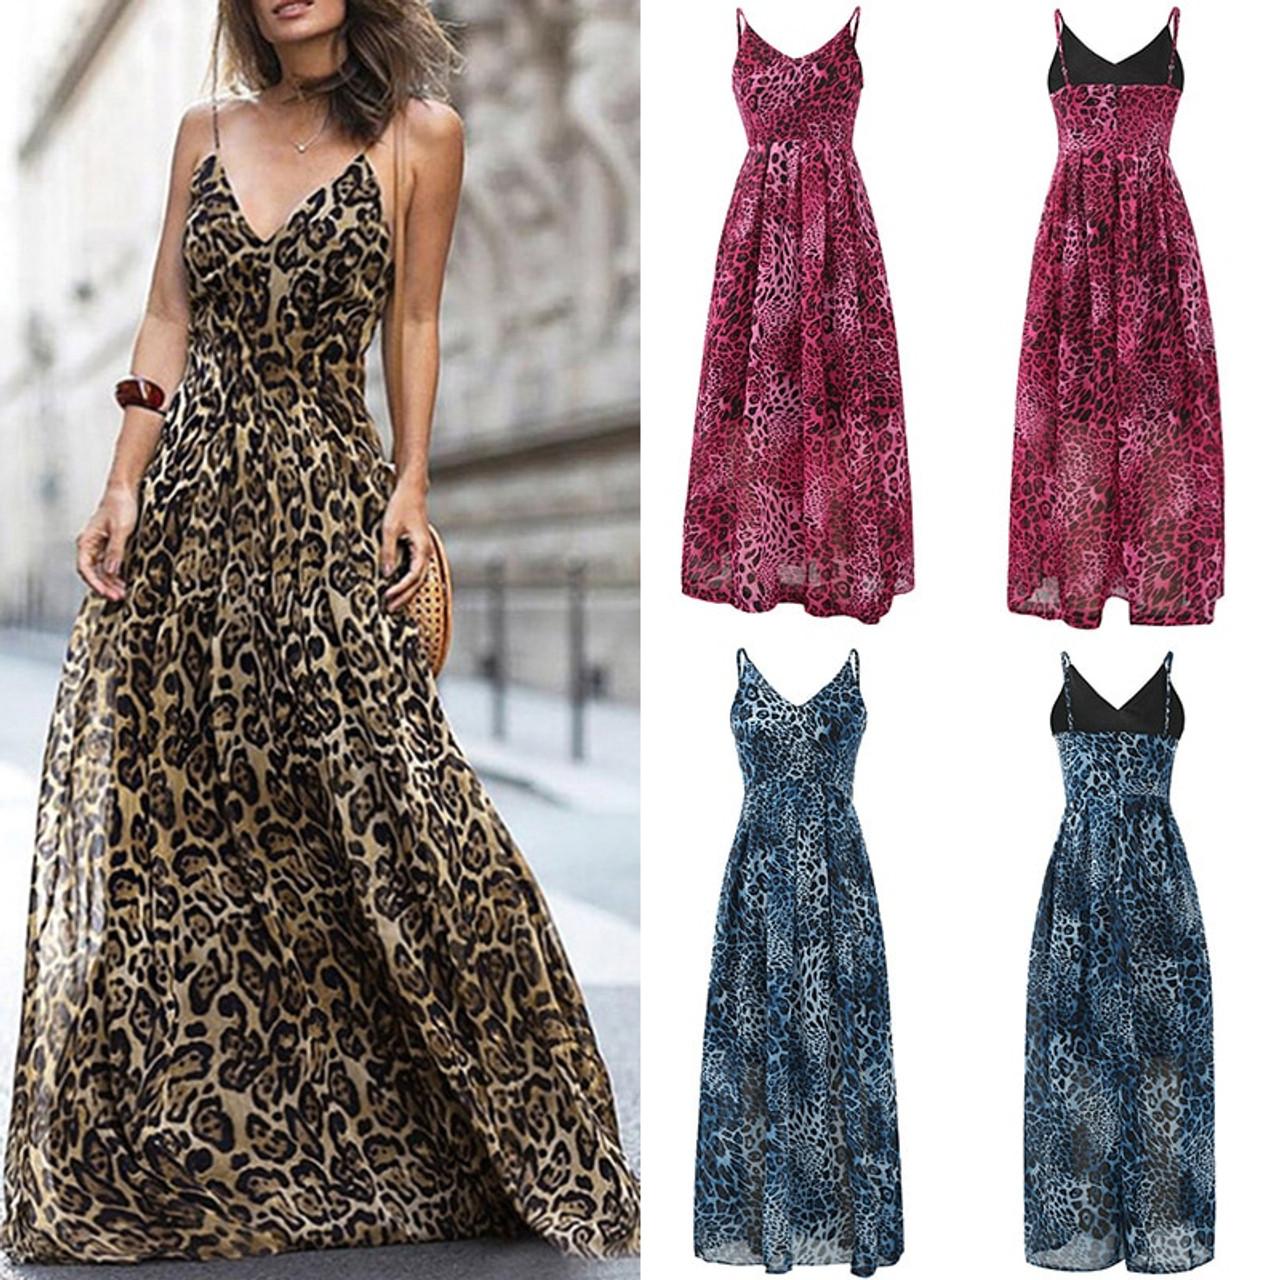 67fb95c357f ... HOT Beach Summer Dress 2019 Leopard V Neck Strap Maxi Dress Women  Elegant Sleeveless Clothing Floor ...